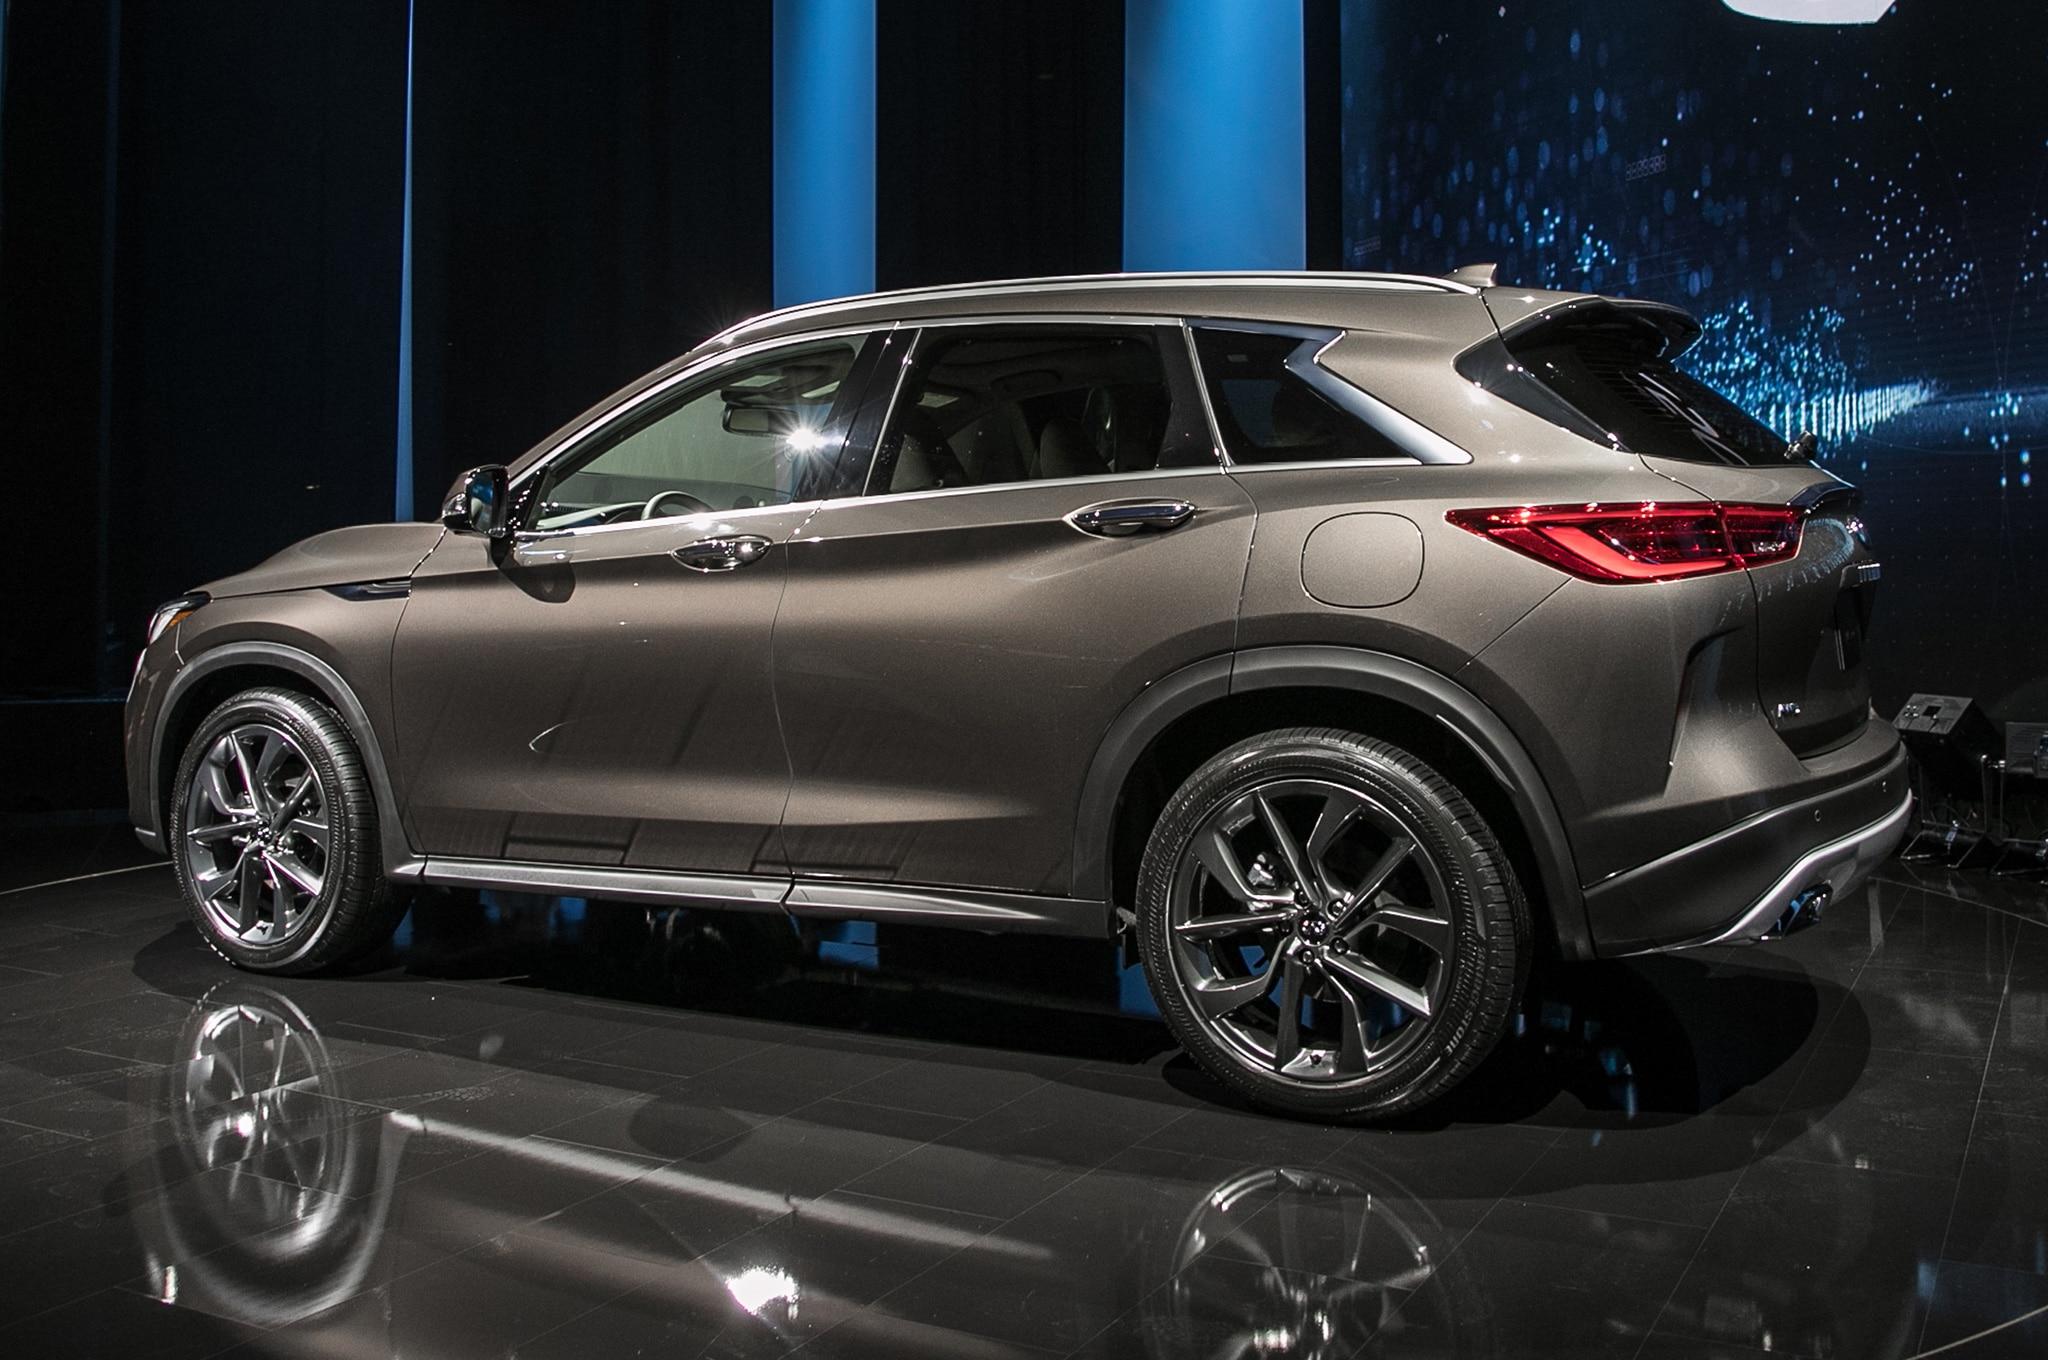 2019 infiniti qx50 revealed ahead of 2017 los angeles auto show